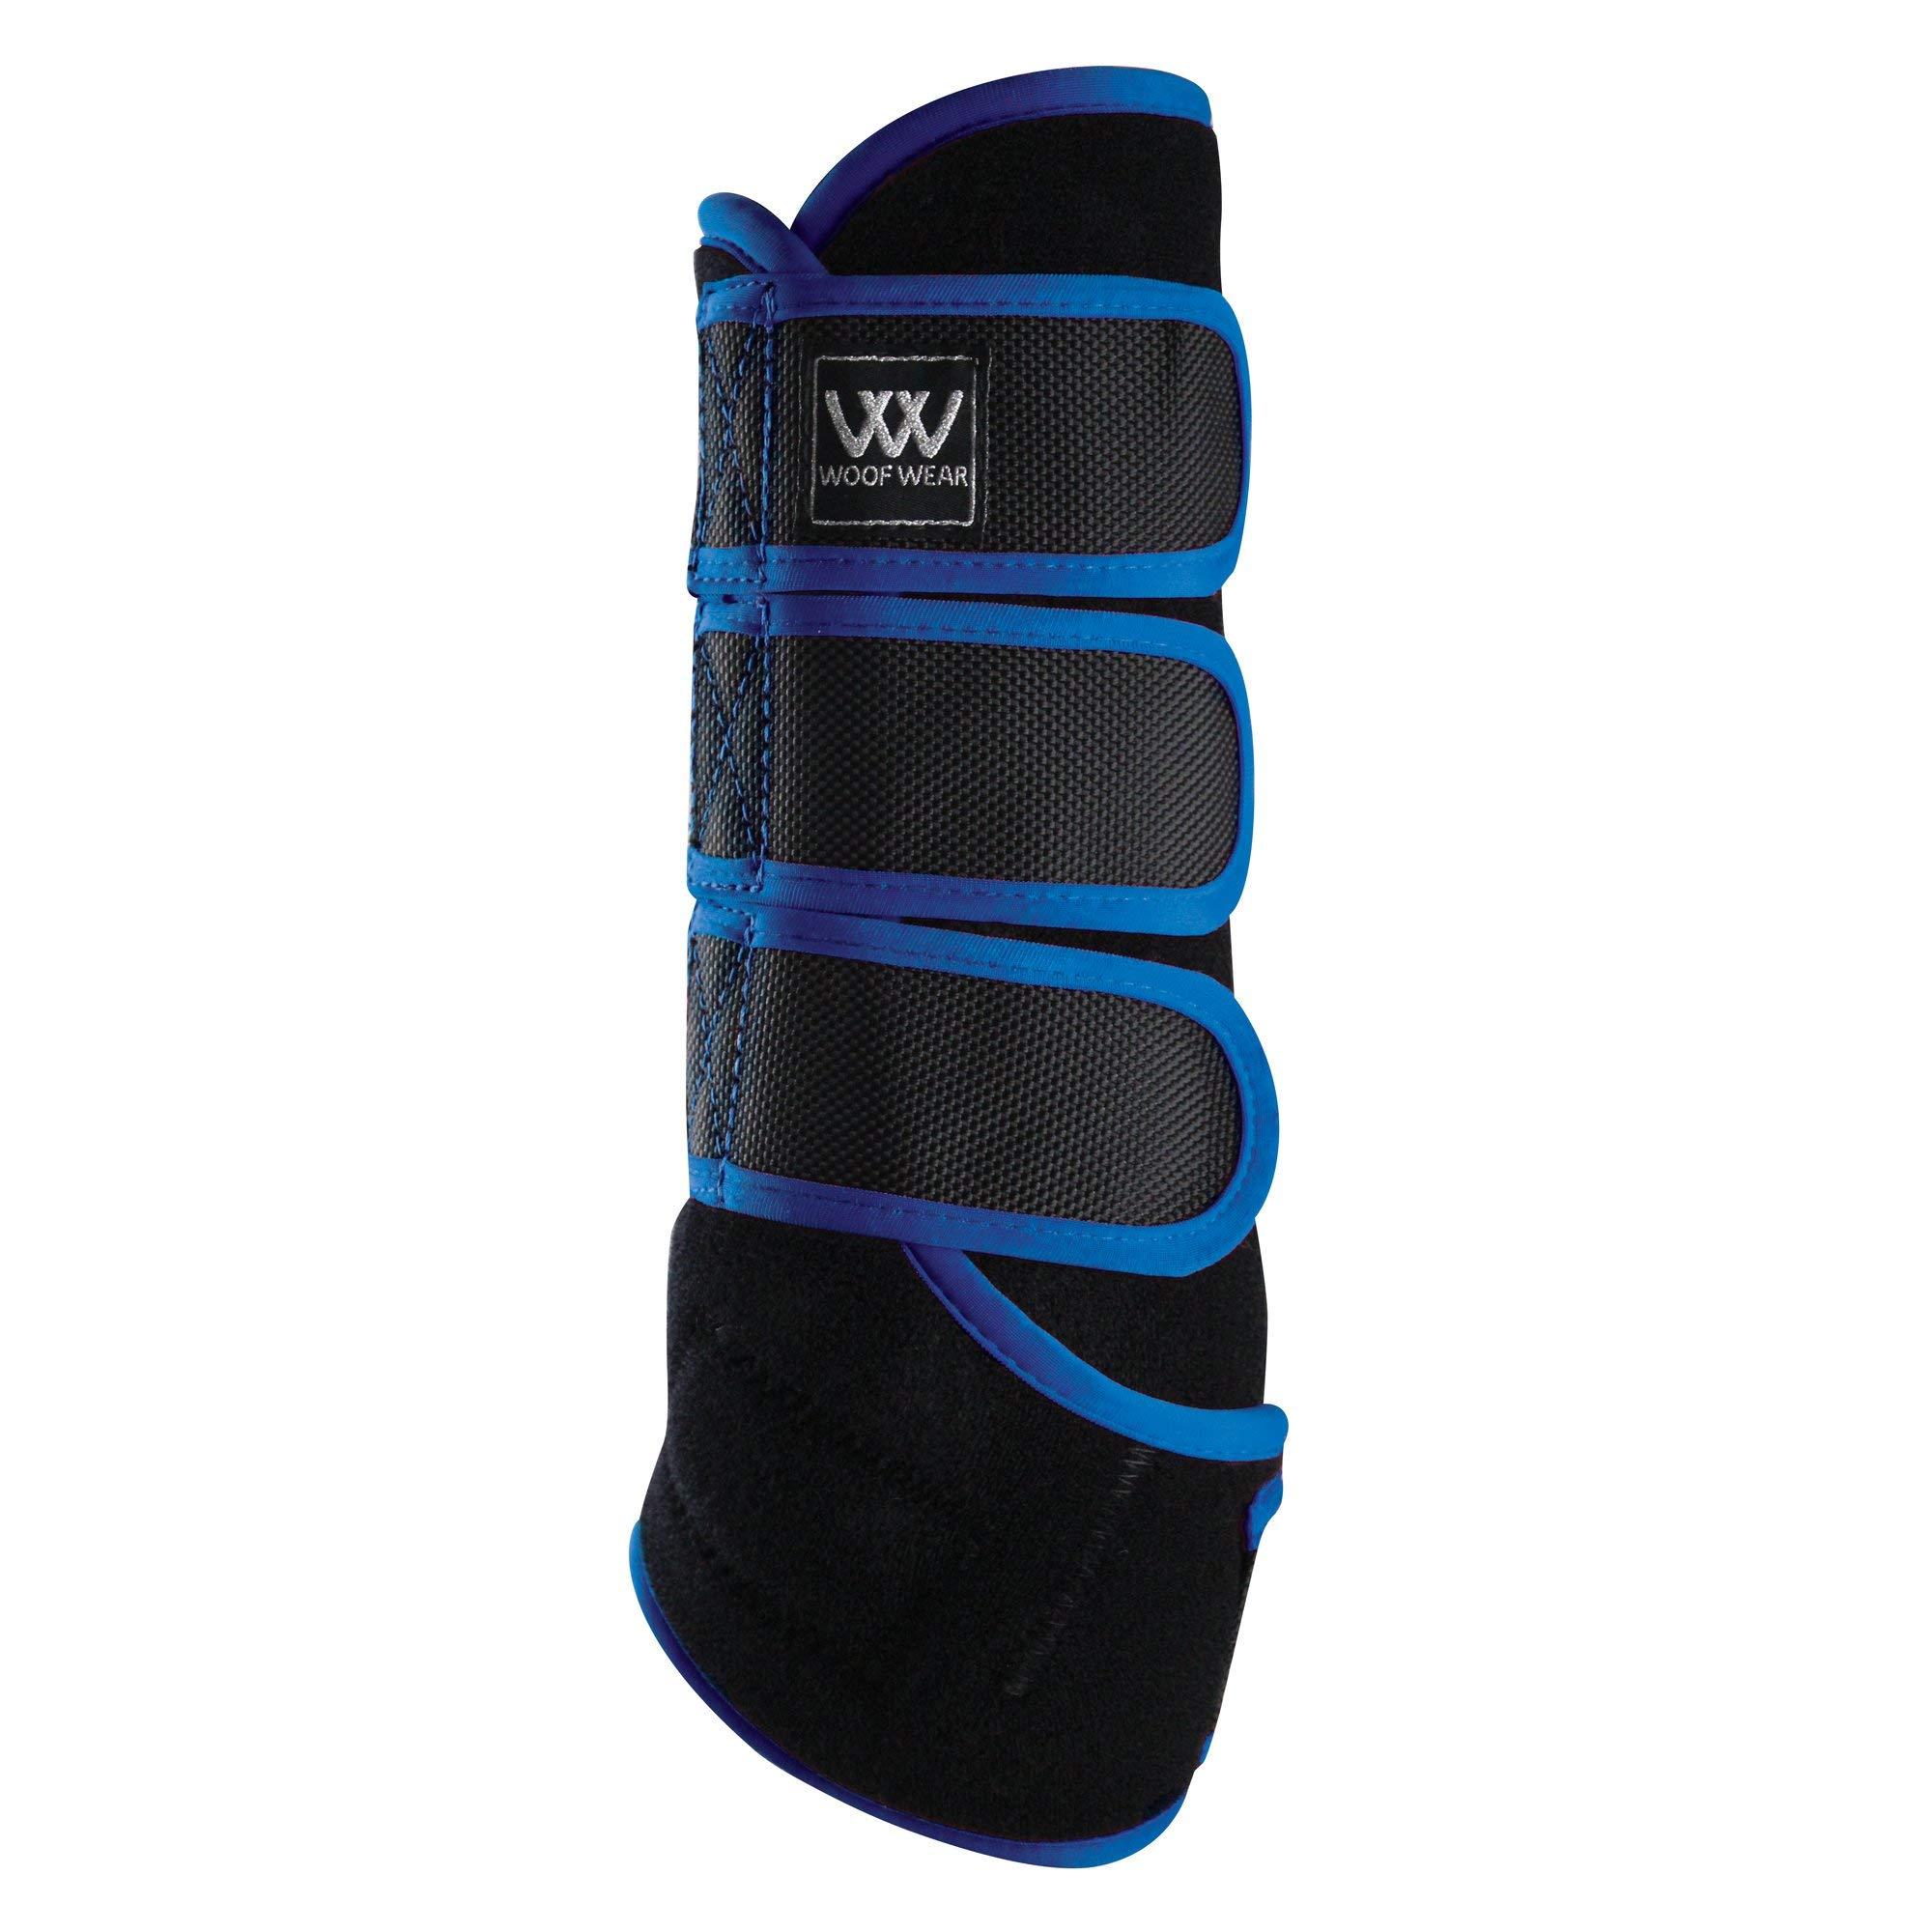 WOOF WEAR Dressage Exercise Wrap X Large Black Electric Blue